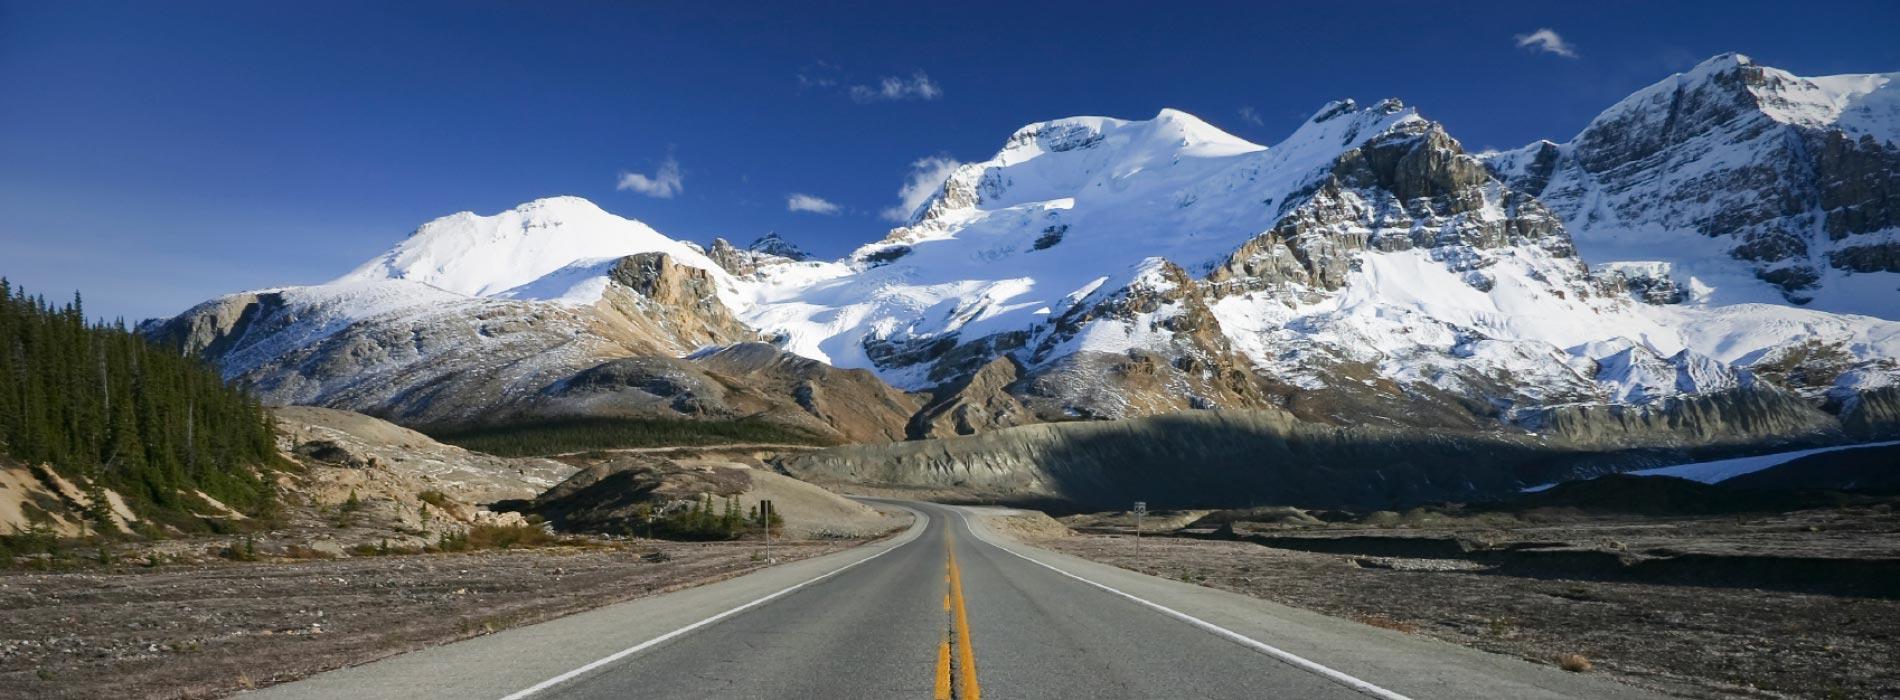 Best Online Travel Deals Canada